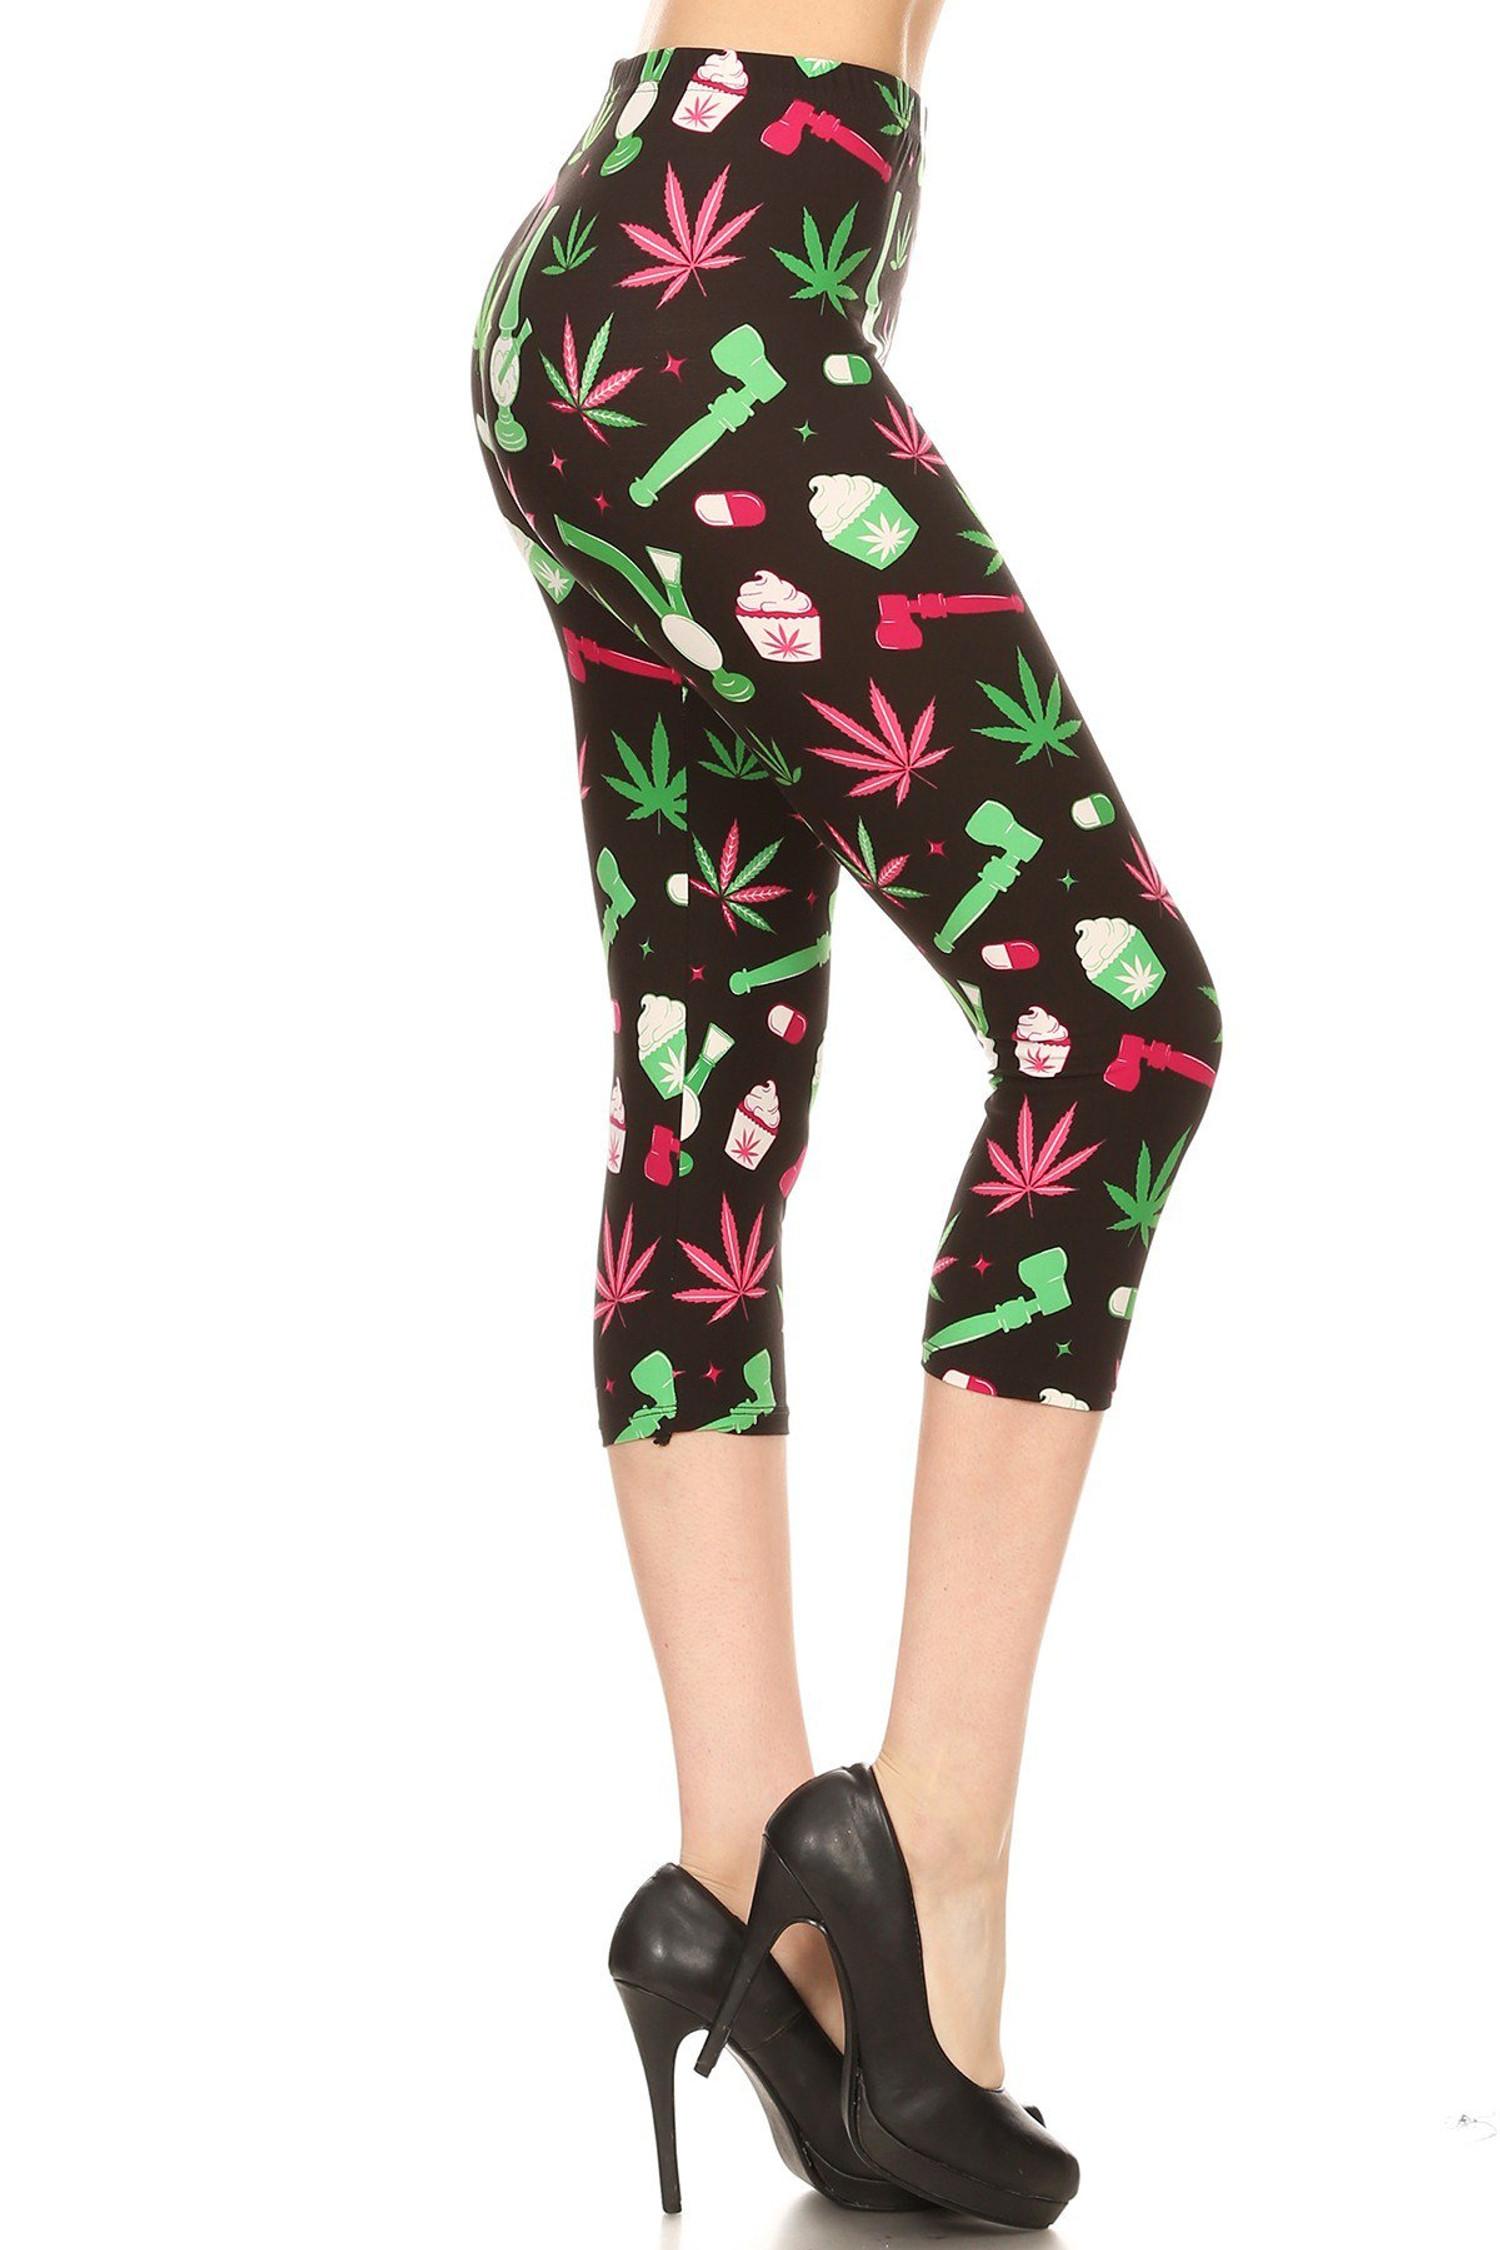 Soft Brushed Marijuana Esprit Extra Plus Size Capris - 3X-5X